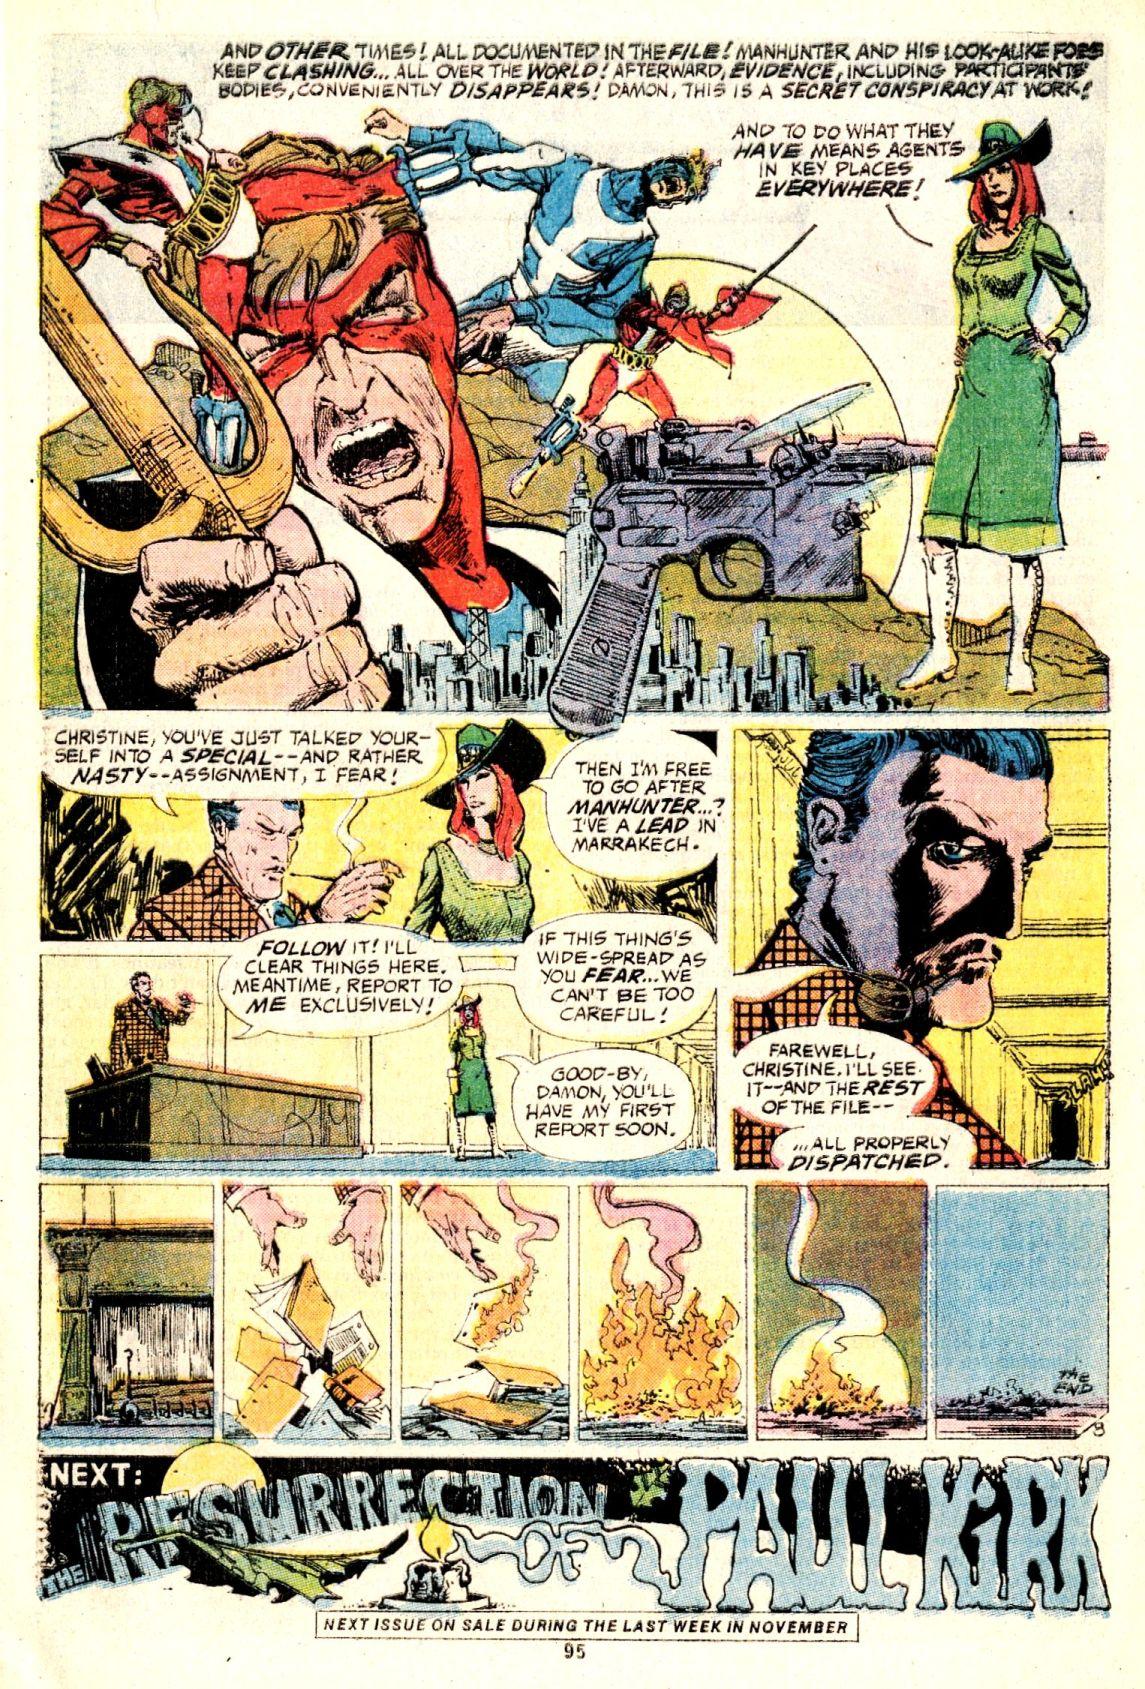 Detective Comics (1937) 438 Page 95